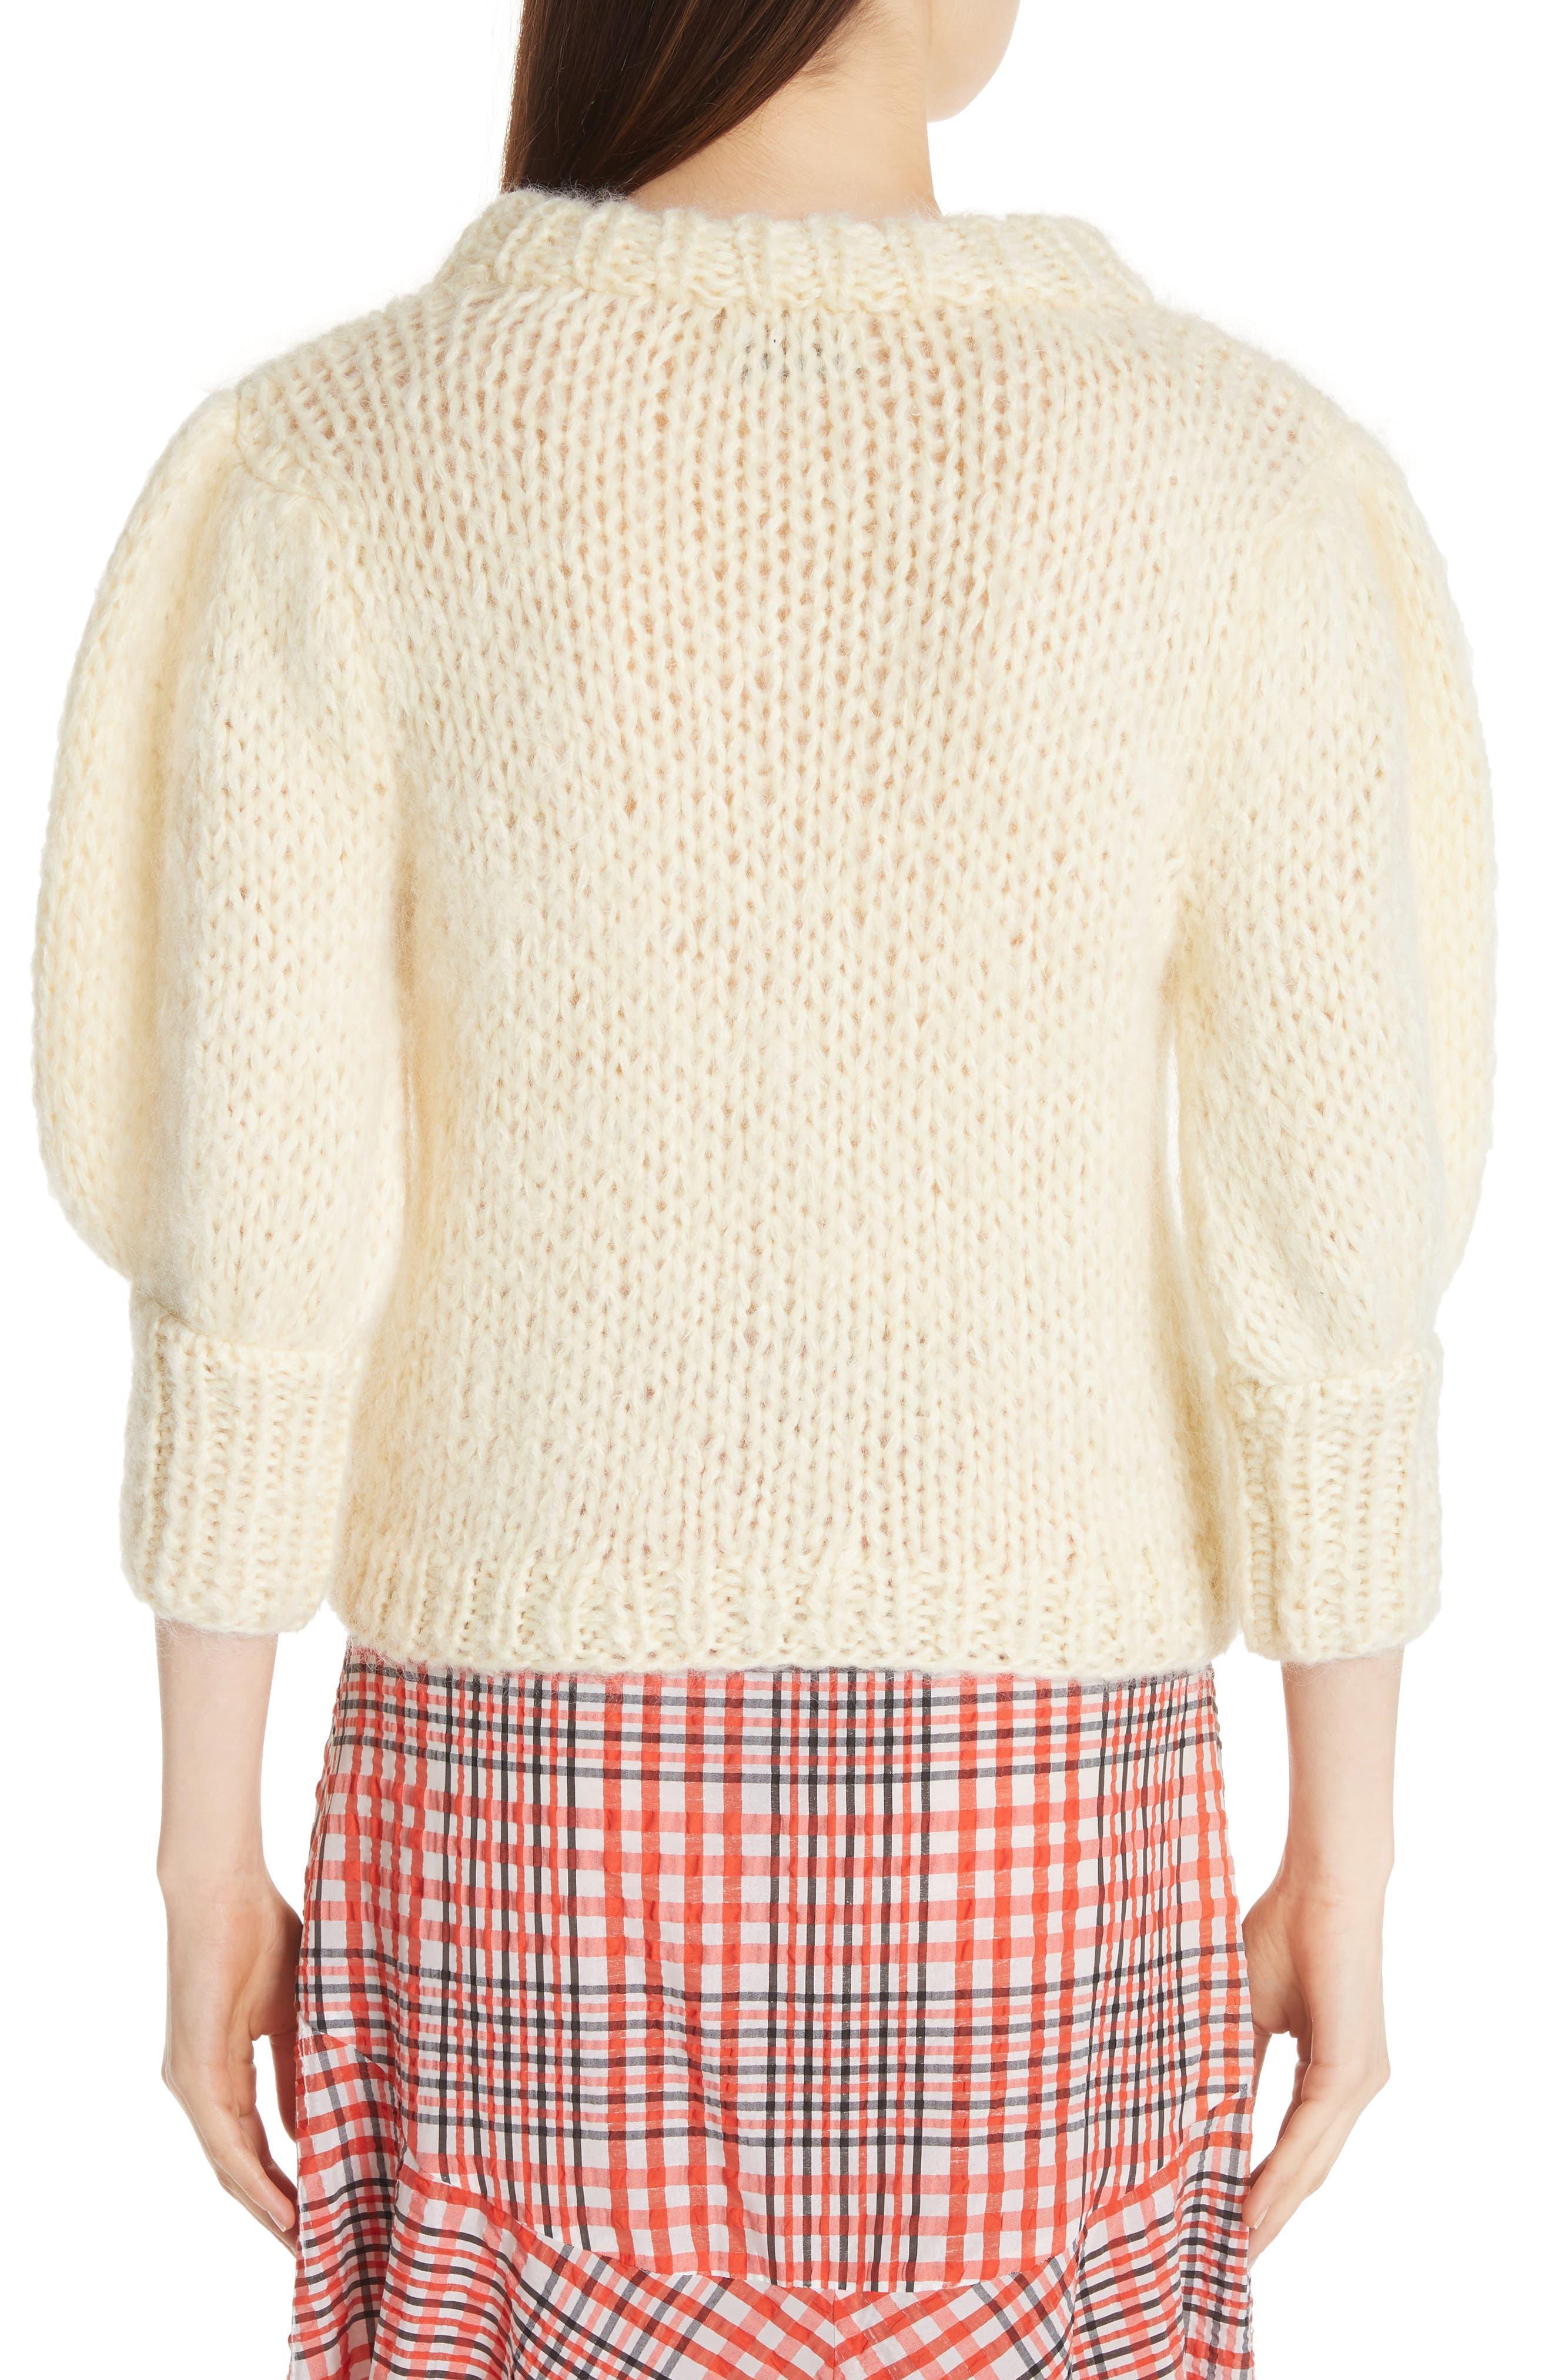 Juilliard Mohair & Wool Puff Sleeve Sweater,                             Alternate thumbnail 2, color,                             900